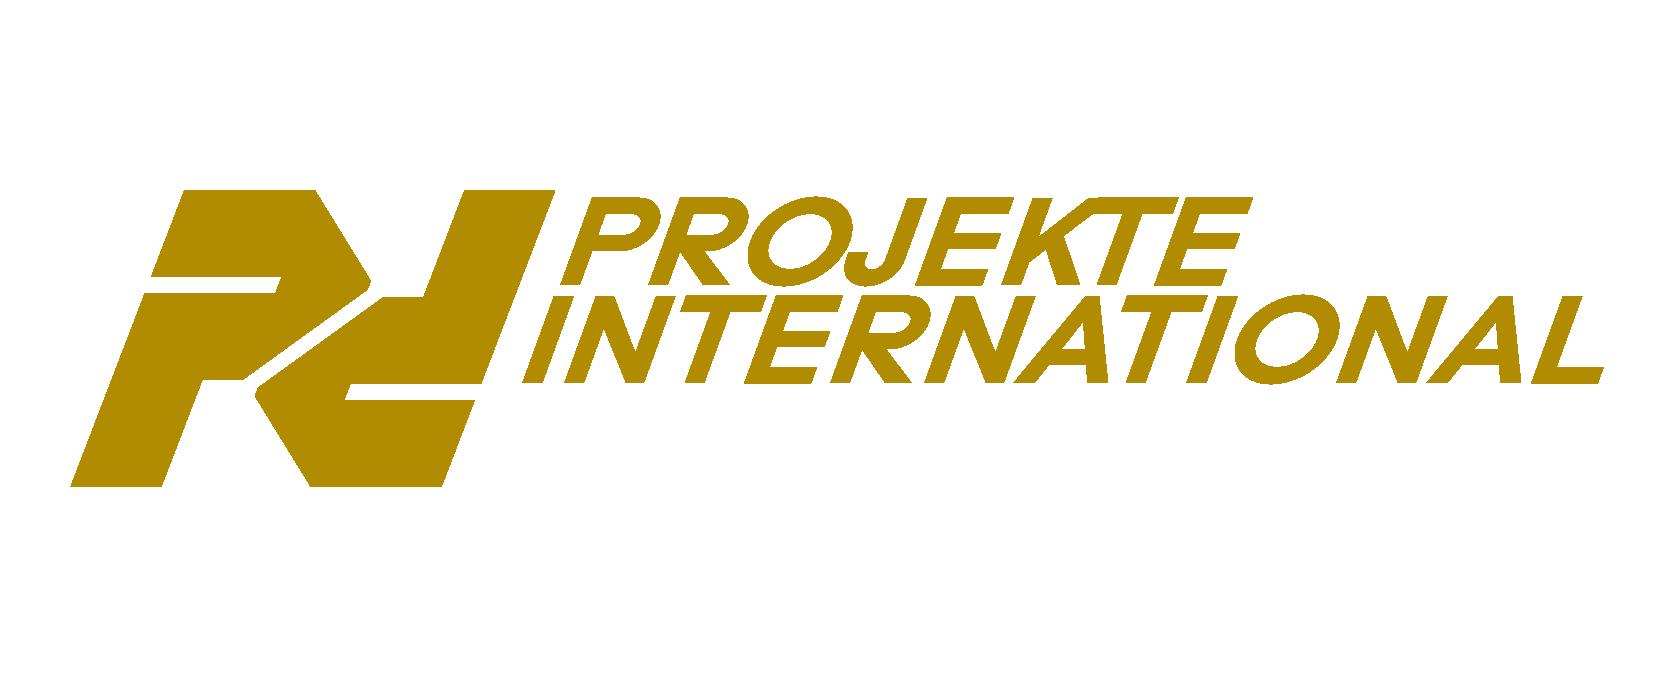 projekte-international3